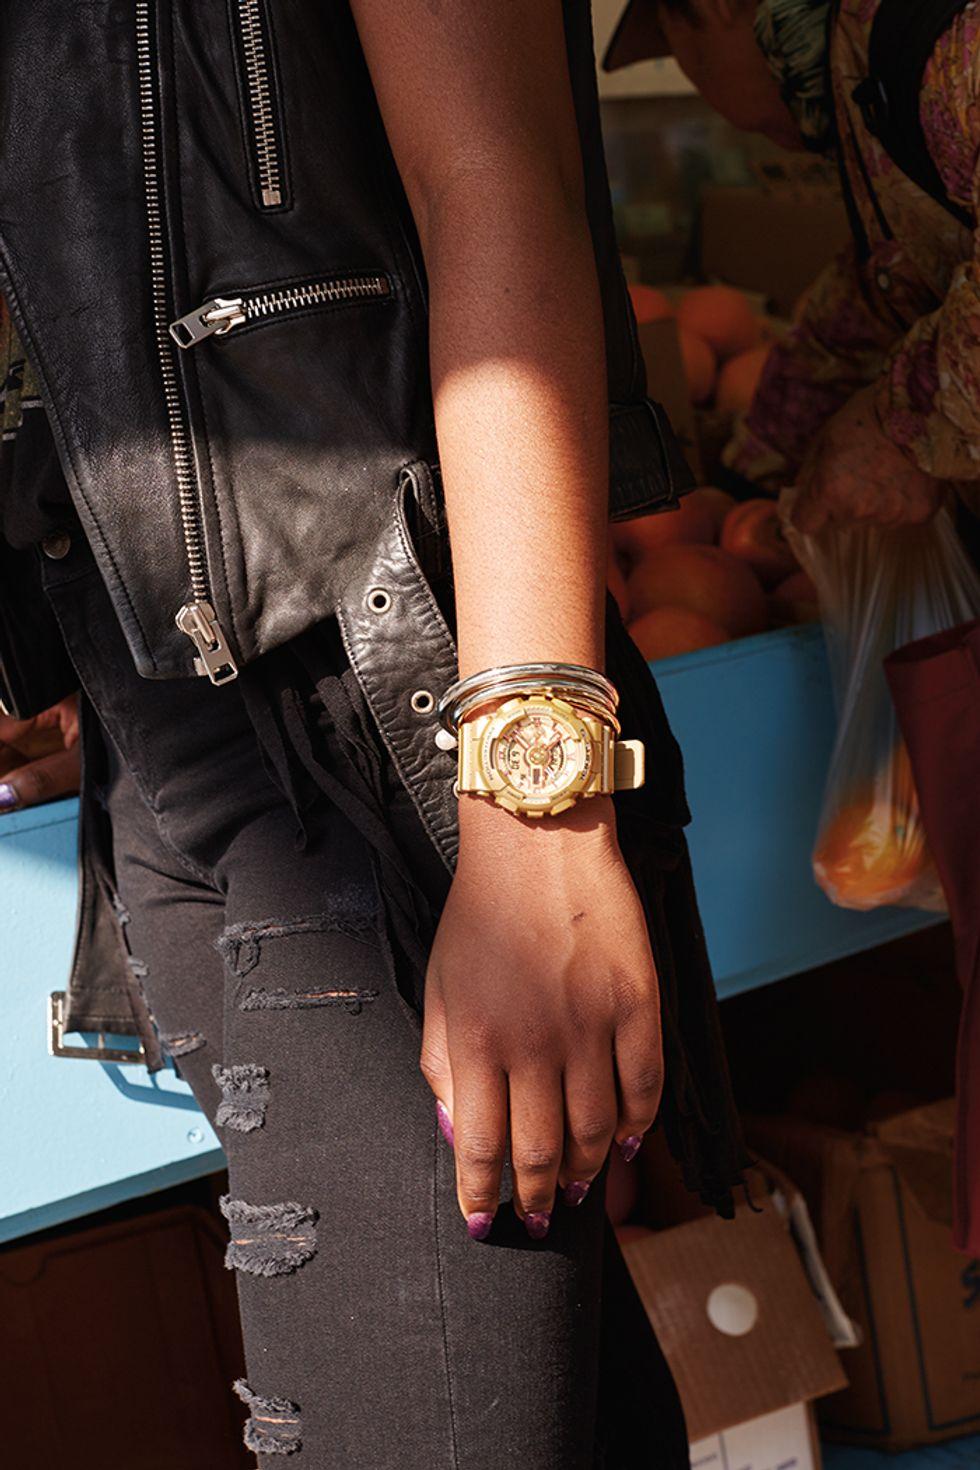 Justine Time: Meet Rising R&B Star Justine Skye